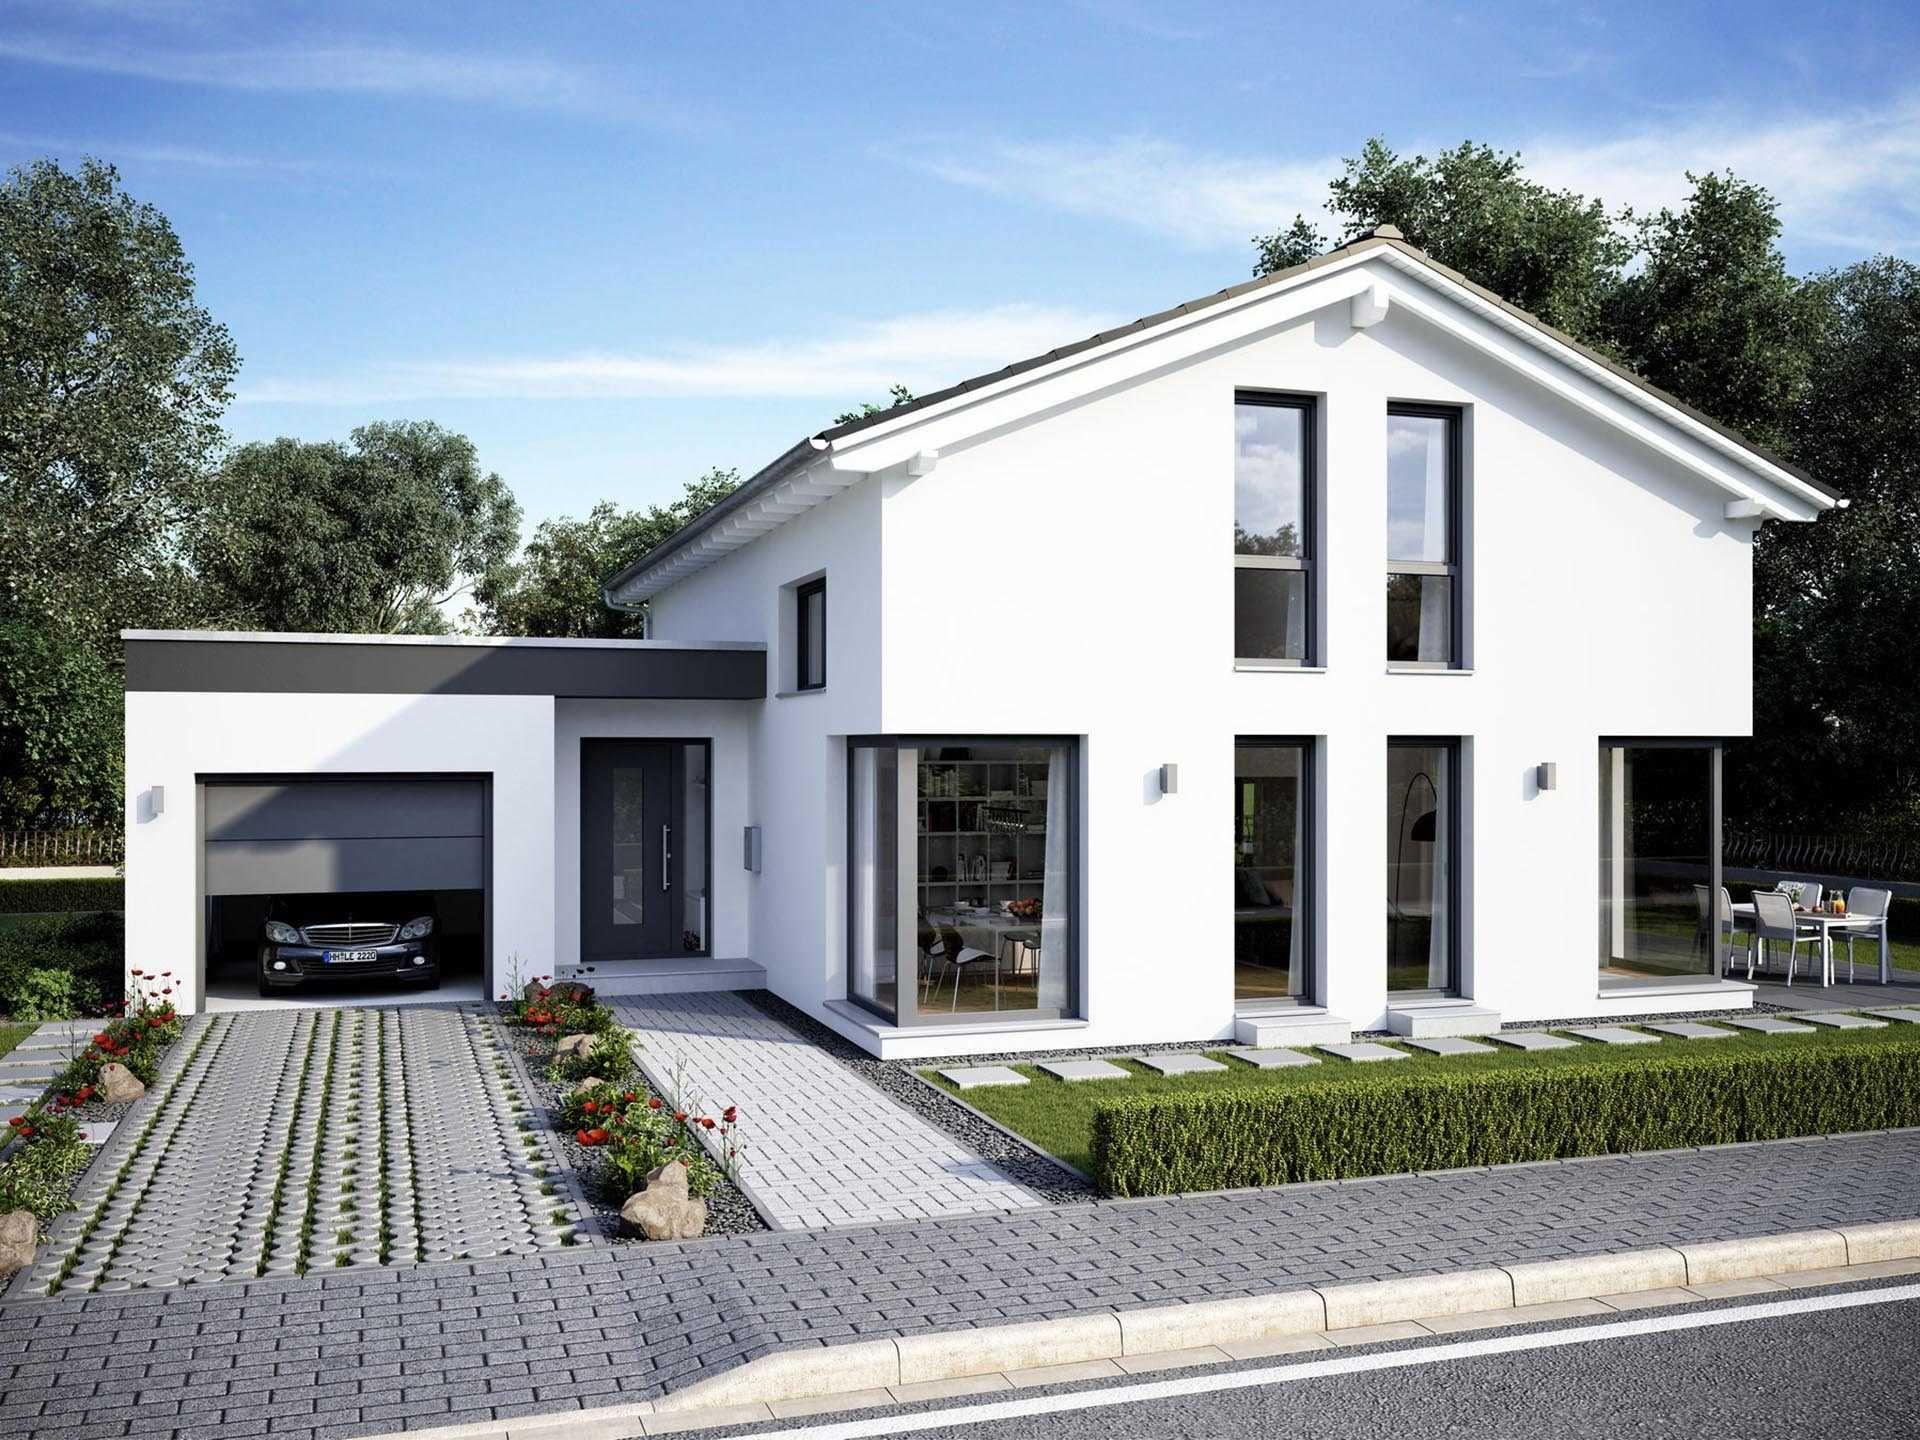 Musterhaus Mülheim-Kärlich - OKAL Haus • Jetzt bei Musterhaus.net ...